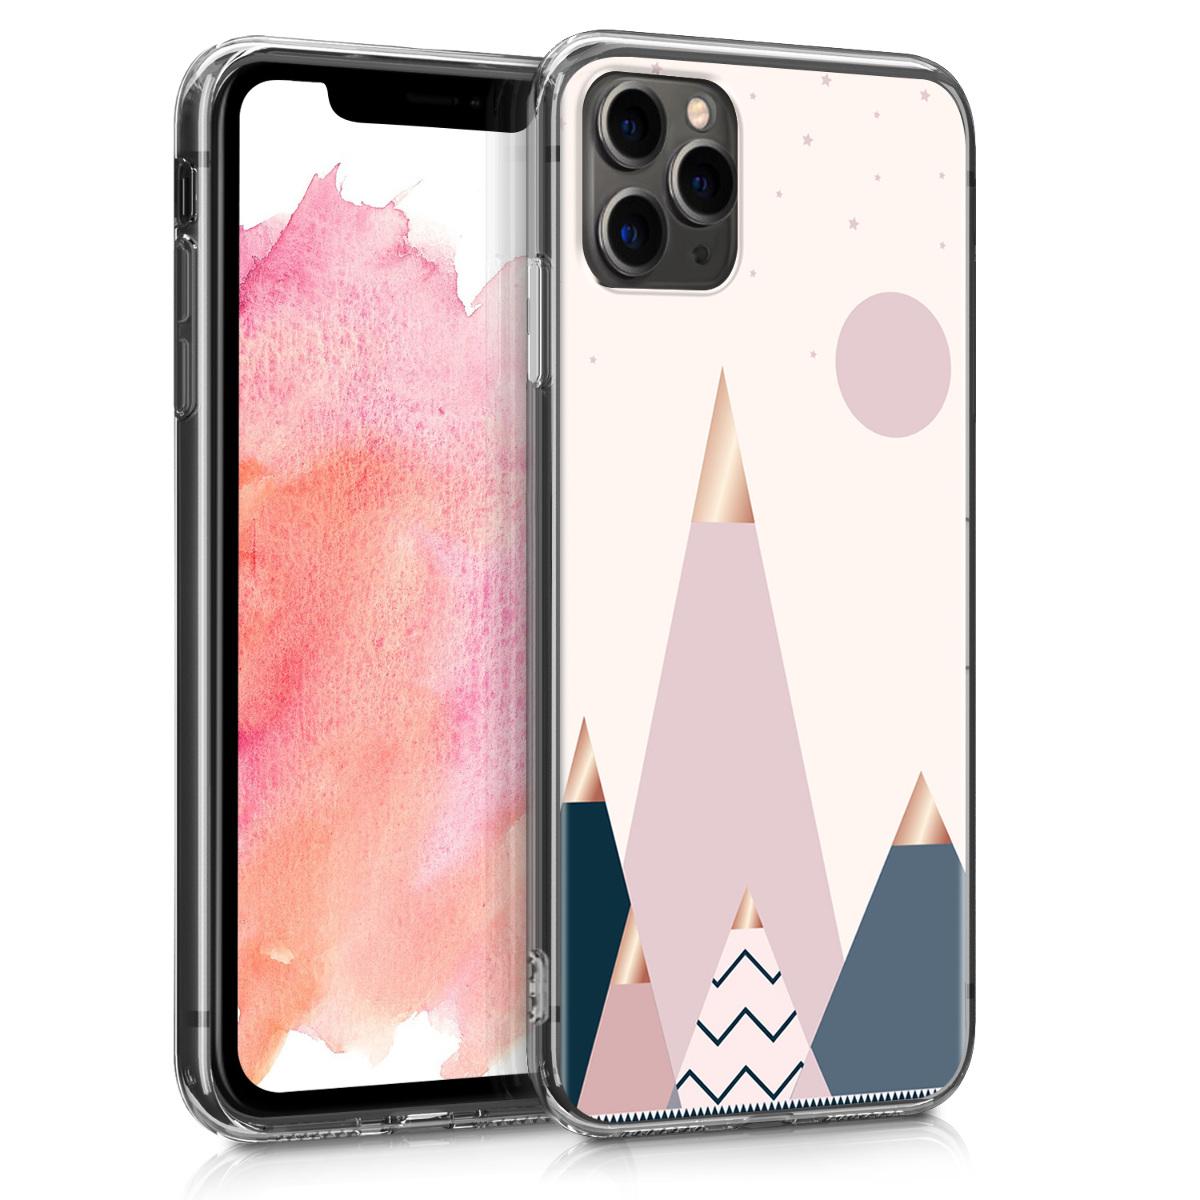 KW Θήκη Σιλικόνης Apple iPhone 11 Pro Max - Rose Gold / Blue / Light Pink (49786.05)